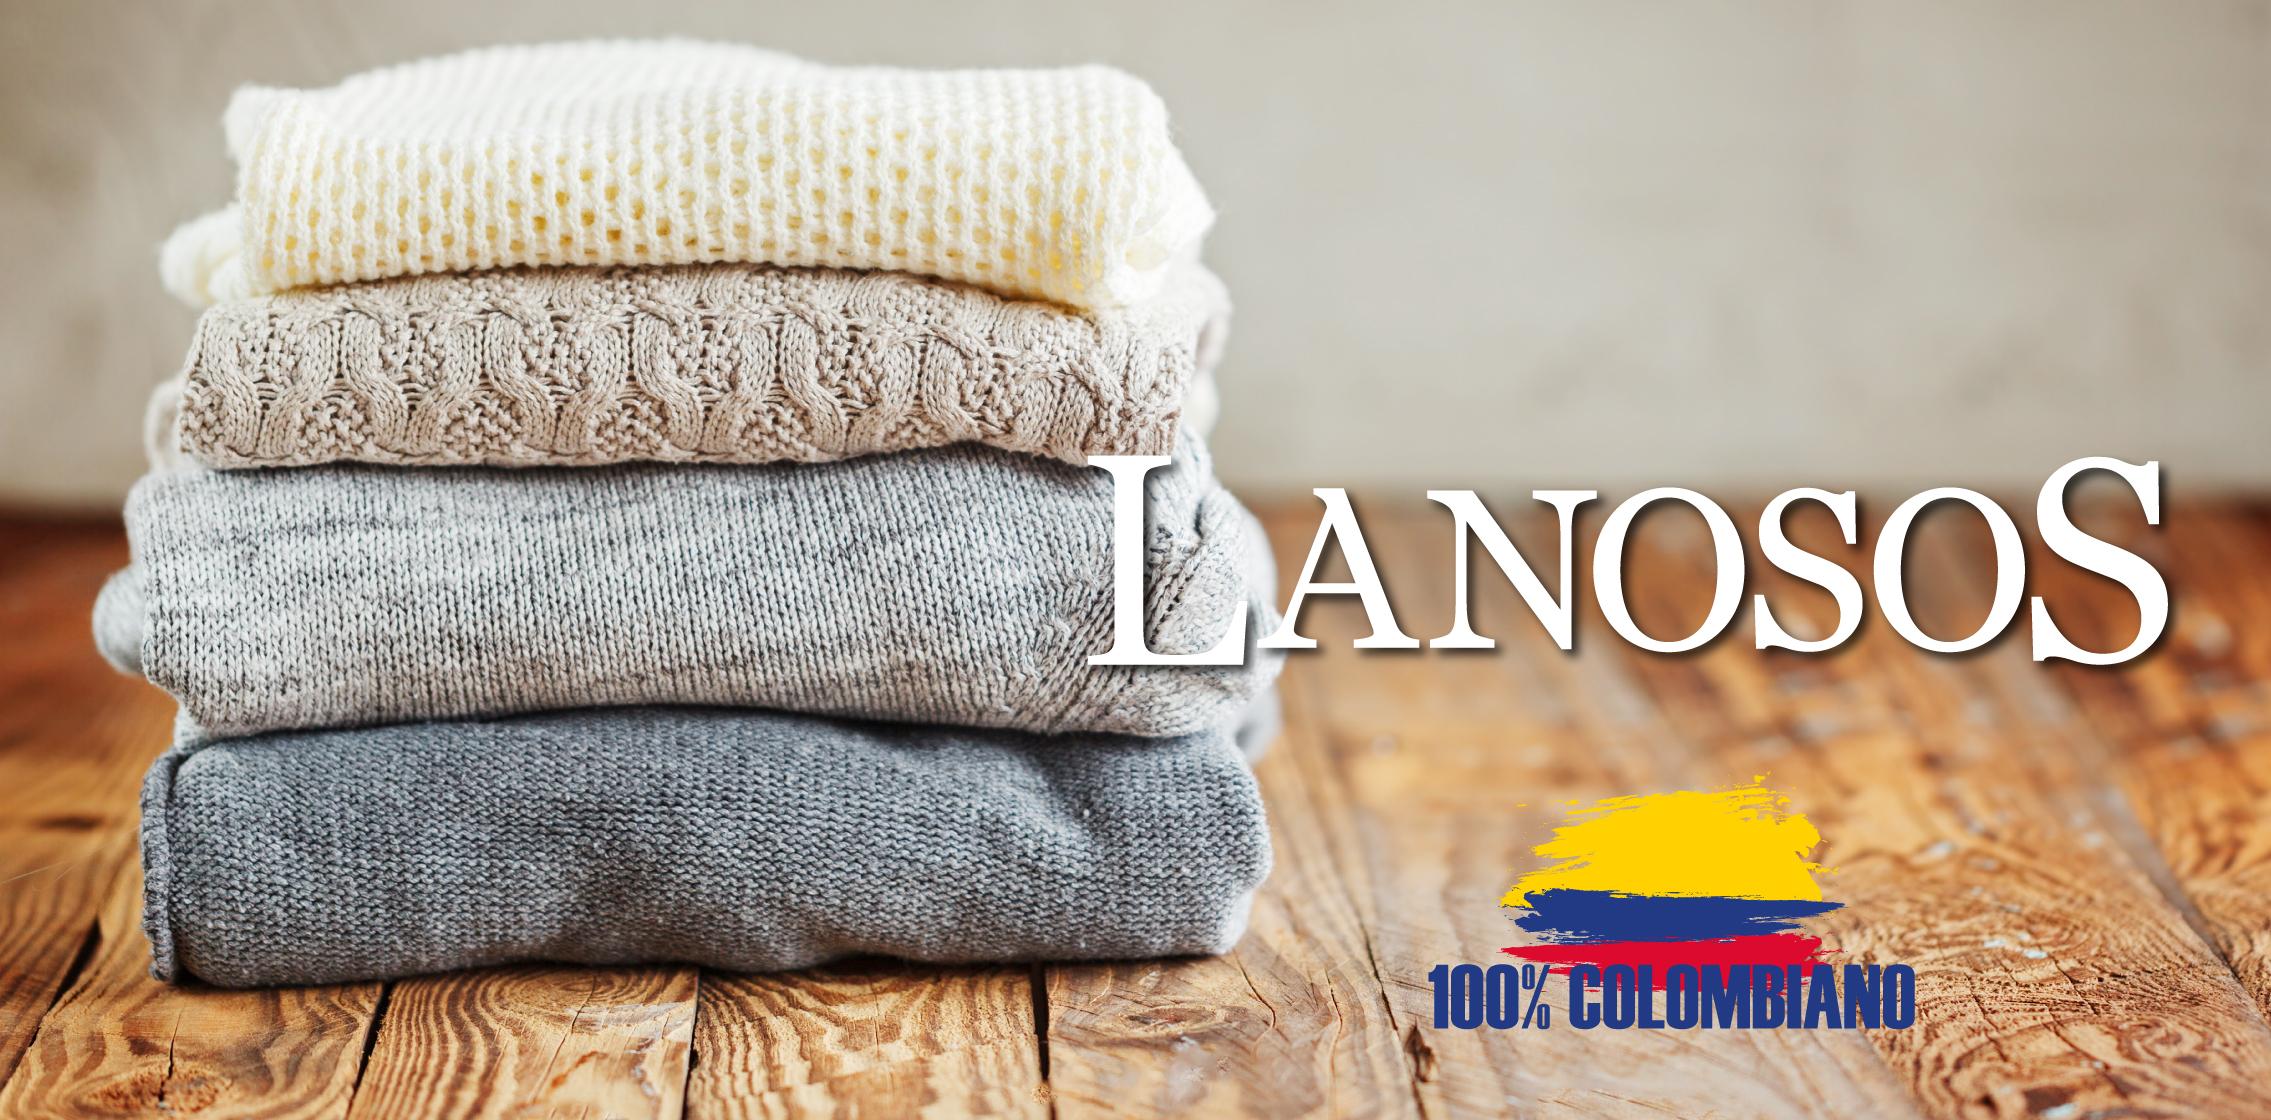 Lanosos07